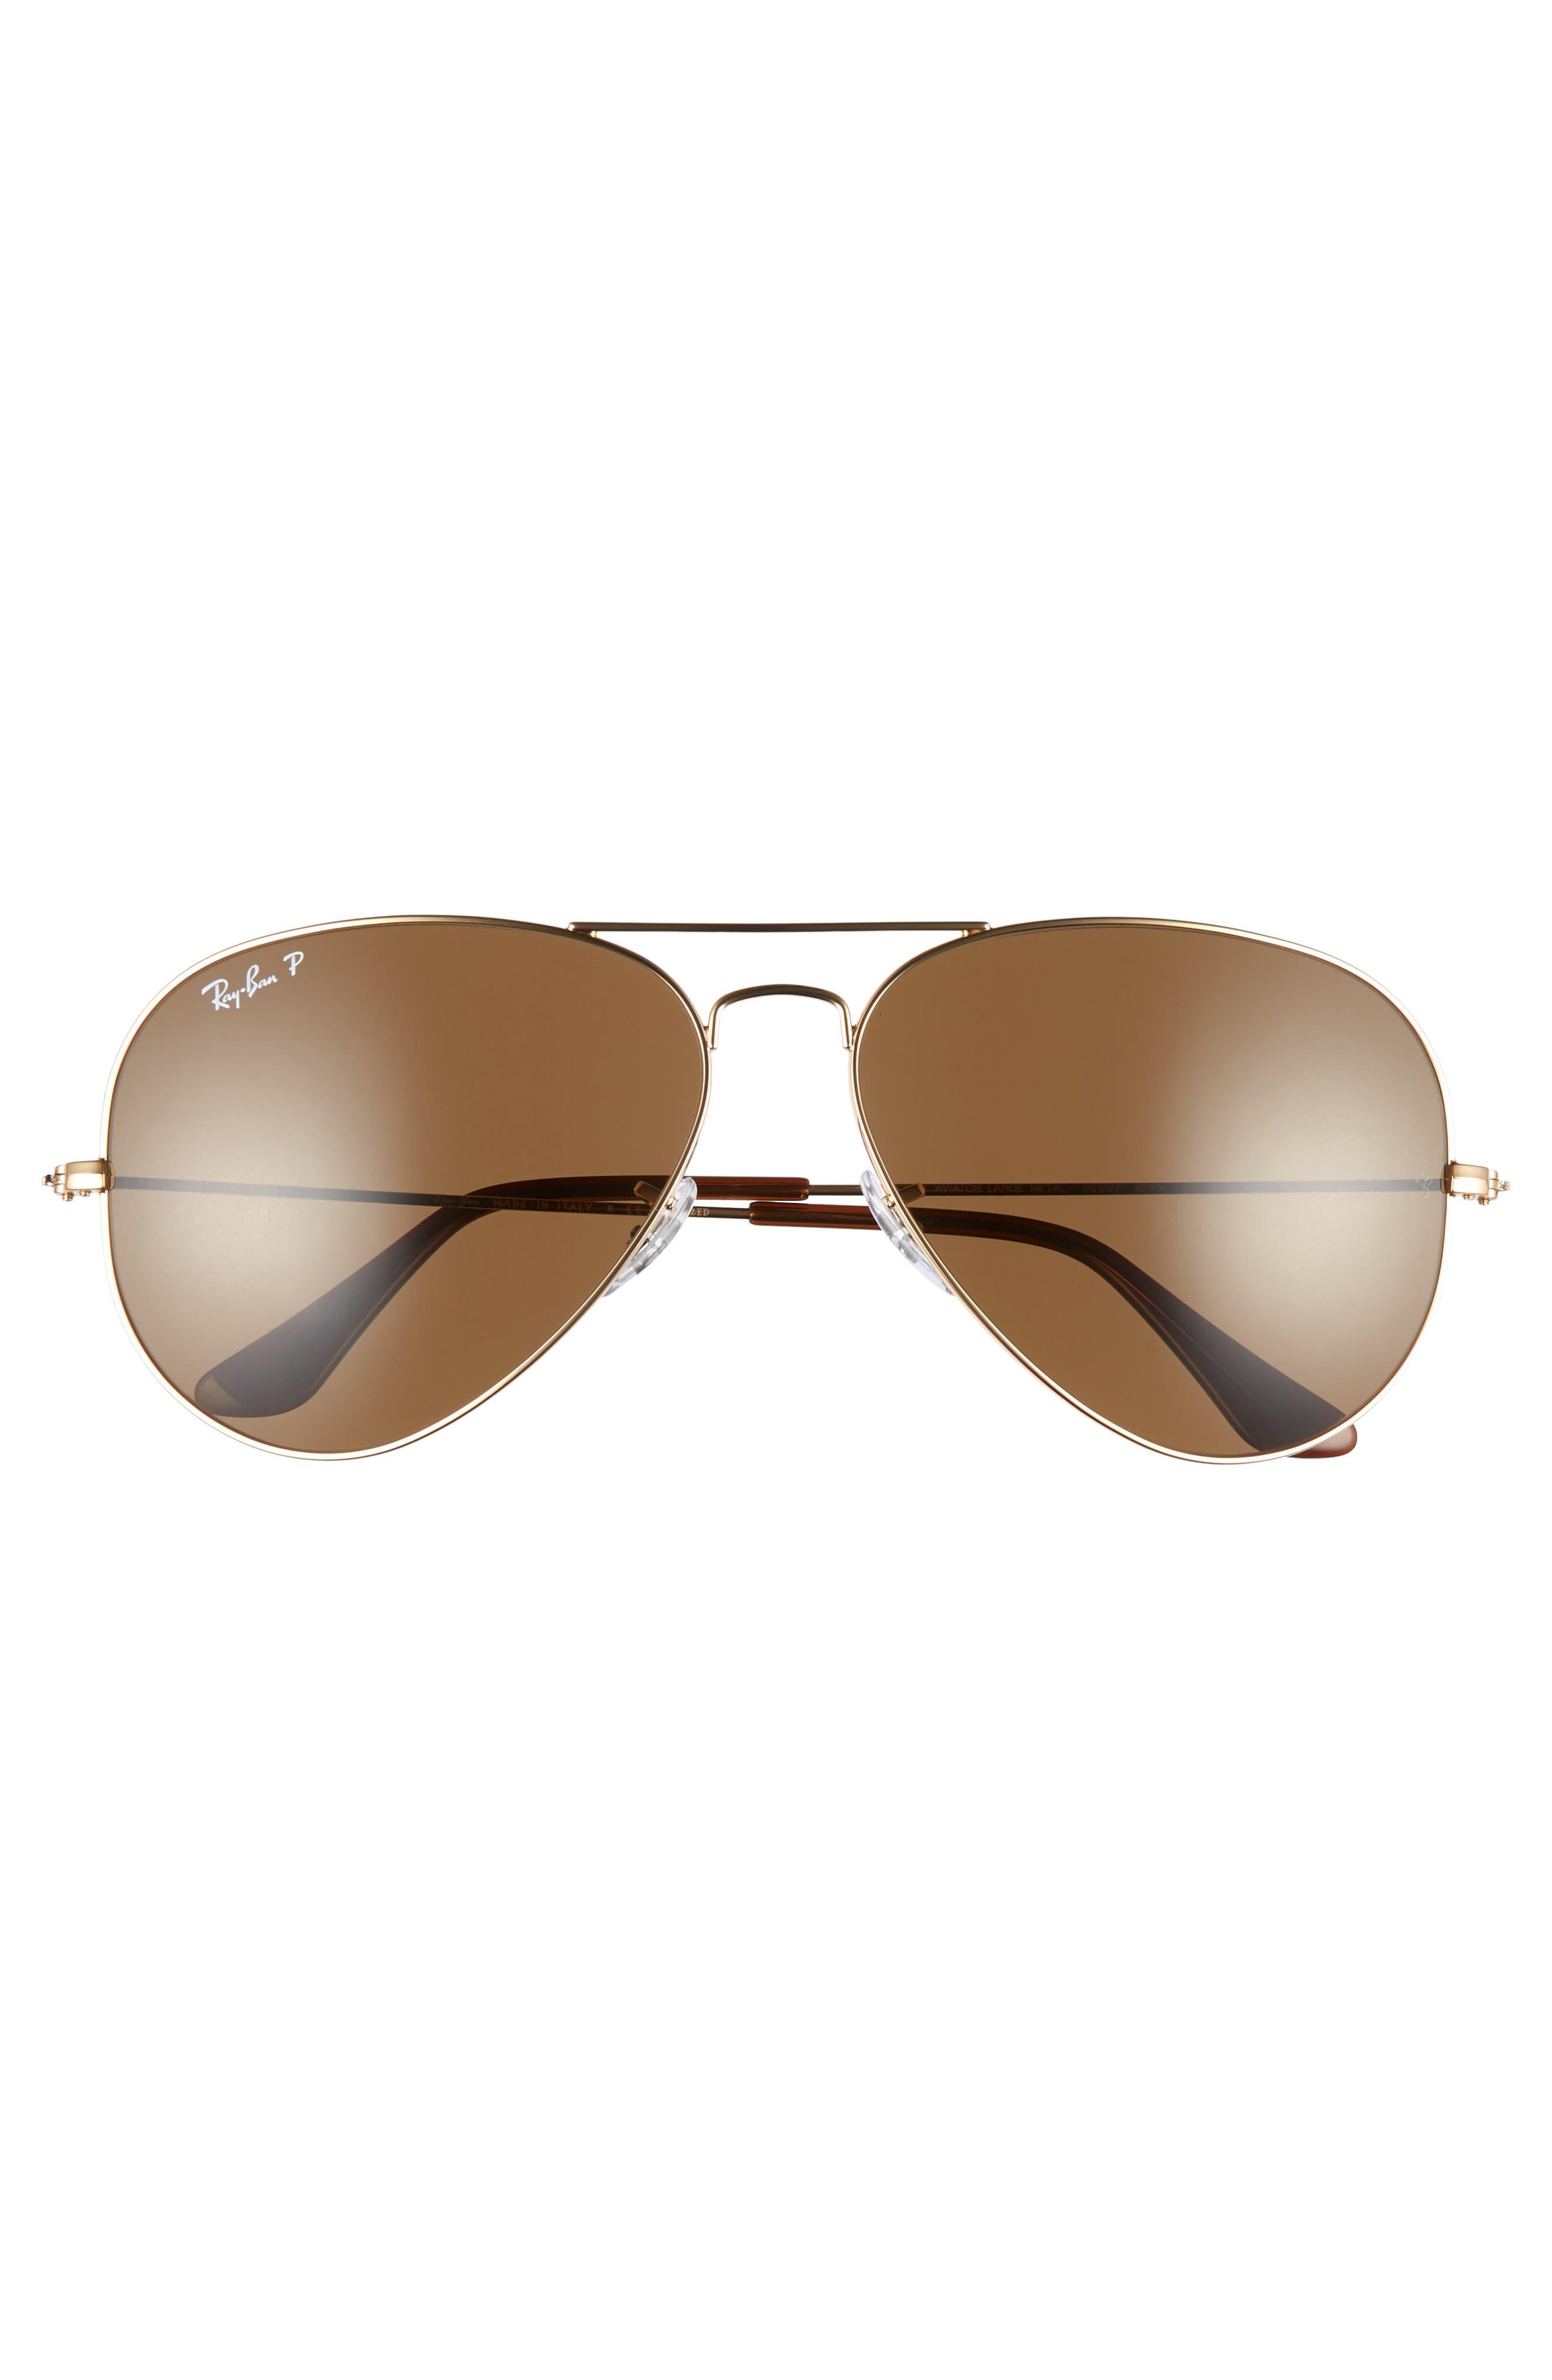 Original 62mm Oversize Polarized Aviator Sunglasses,                             Alternate thumbnail 3, color,                             710